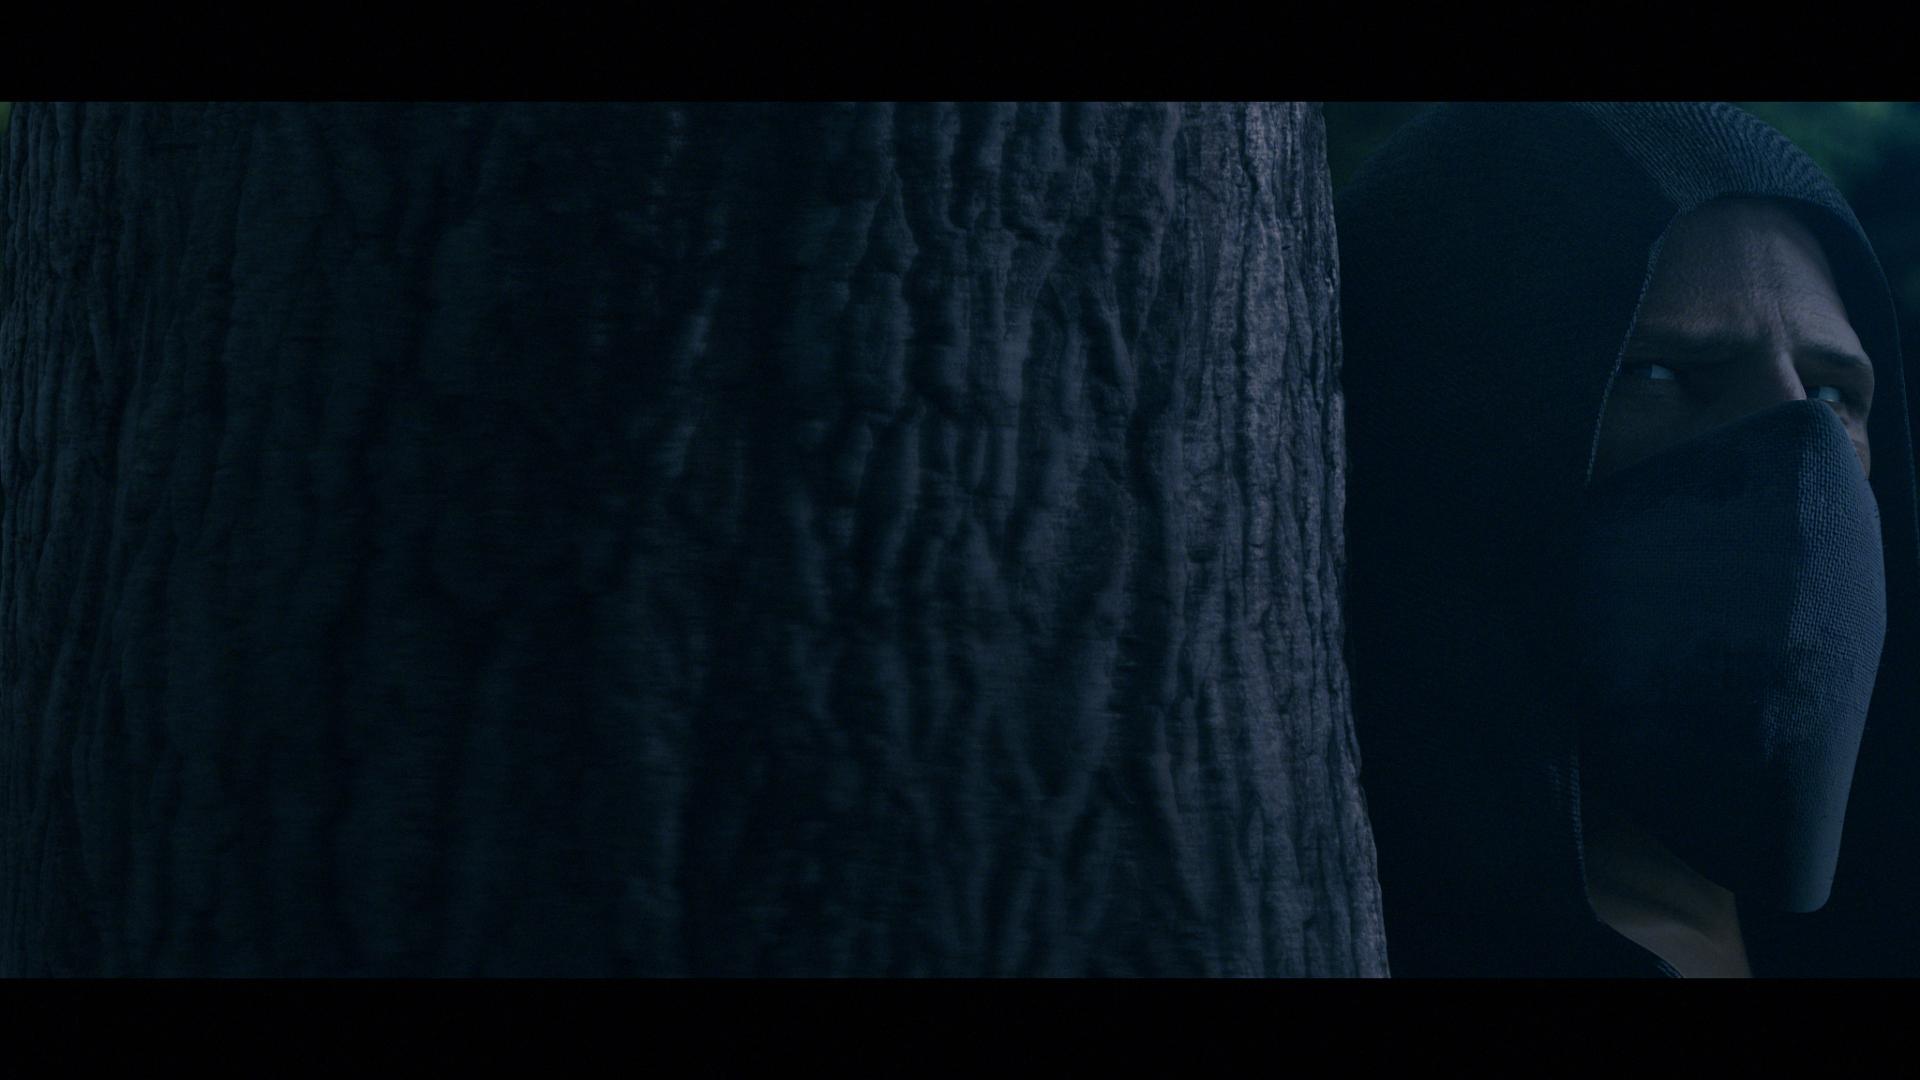 3d-animation-studio-hungary-project-battle-of-debrecen-1